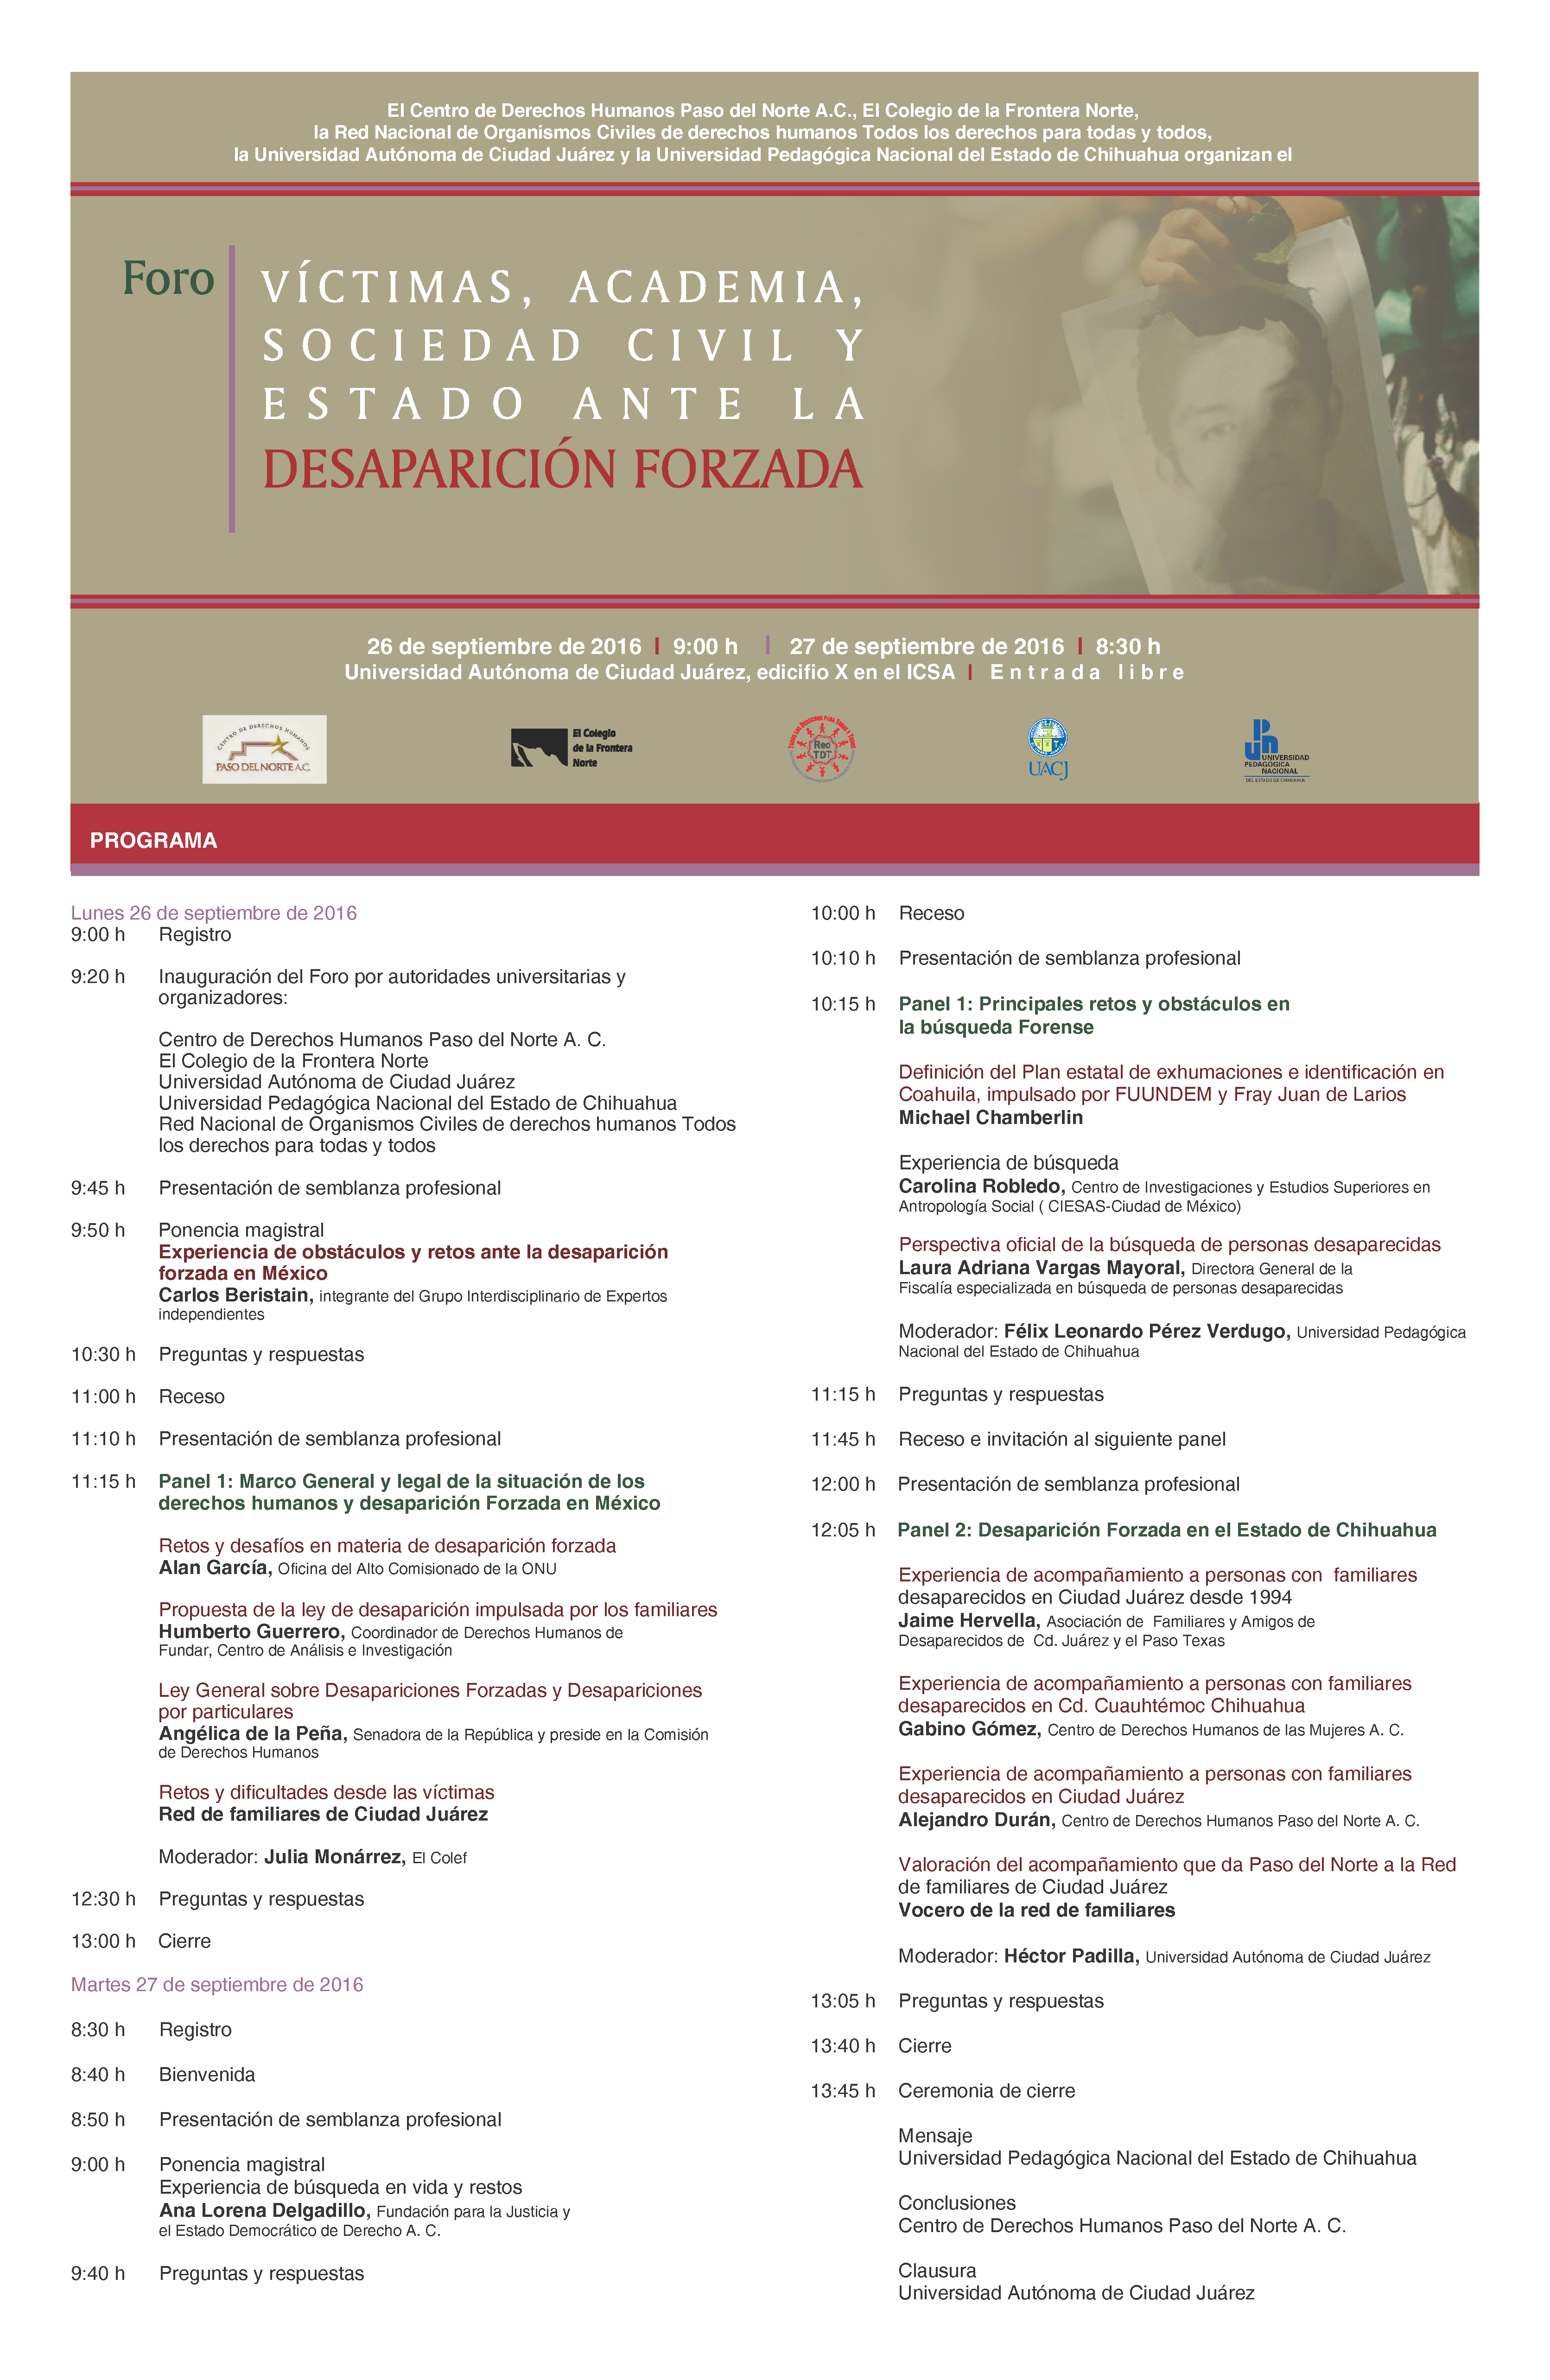 prog-victimas-desaparicion-forzada-26-27sept16-w